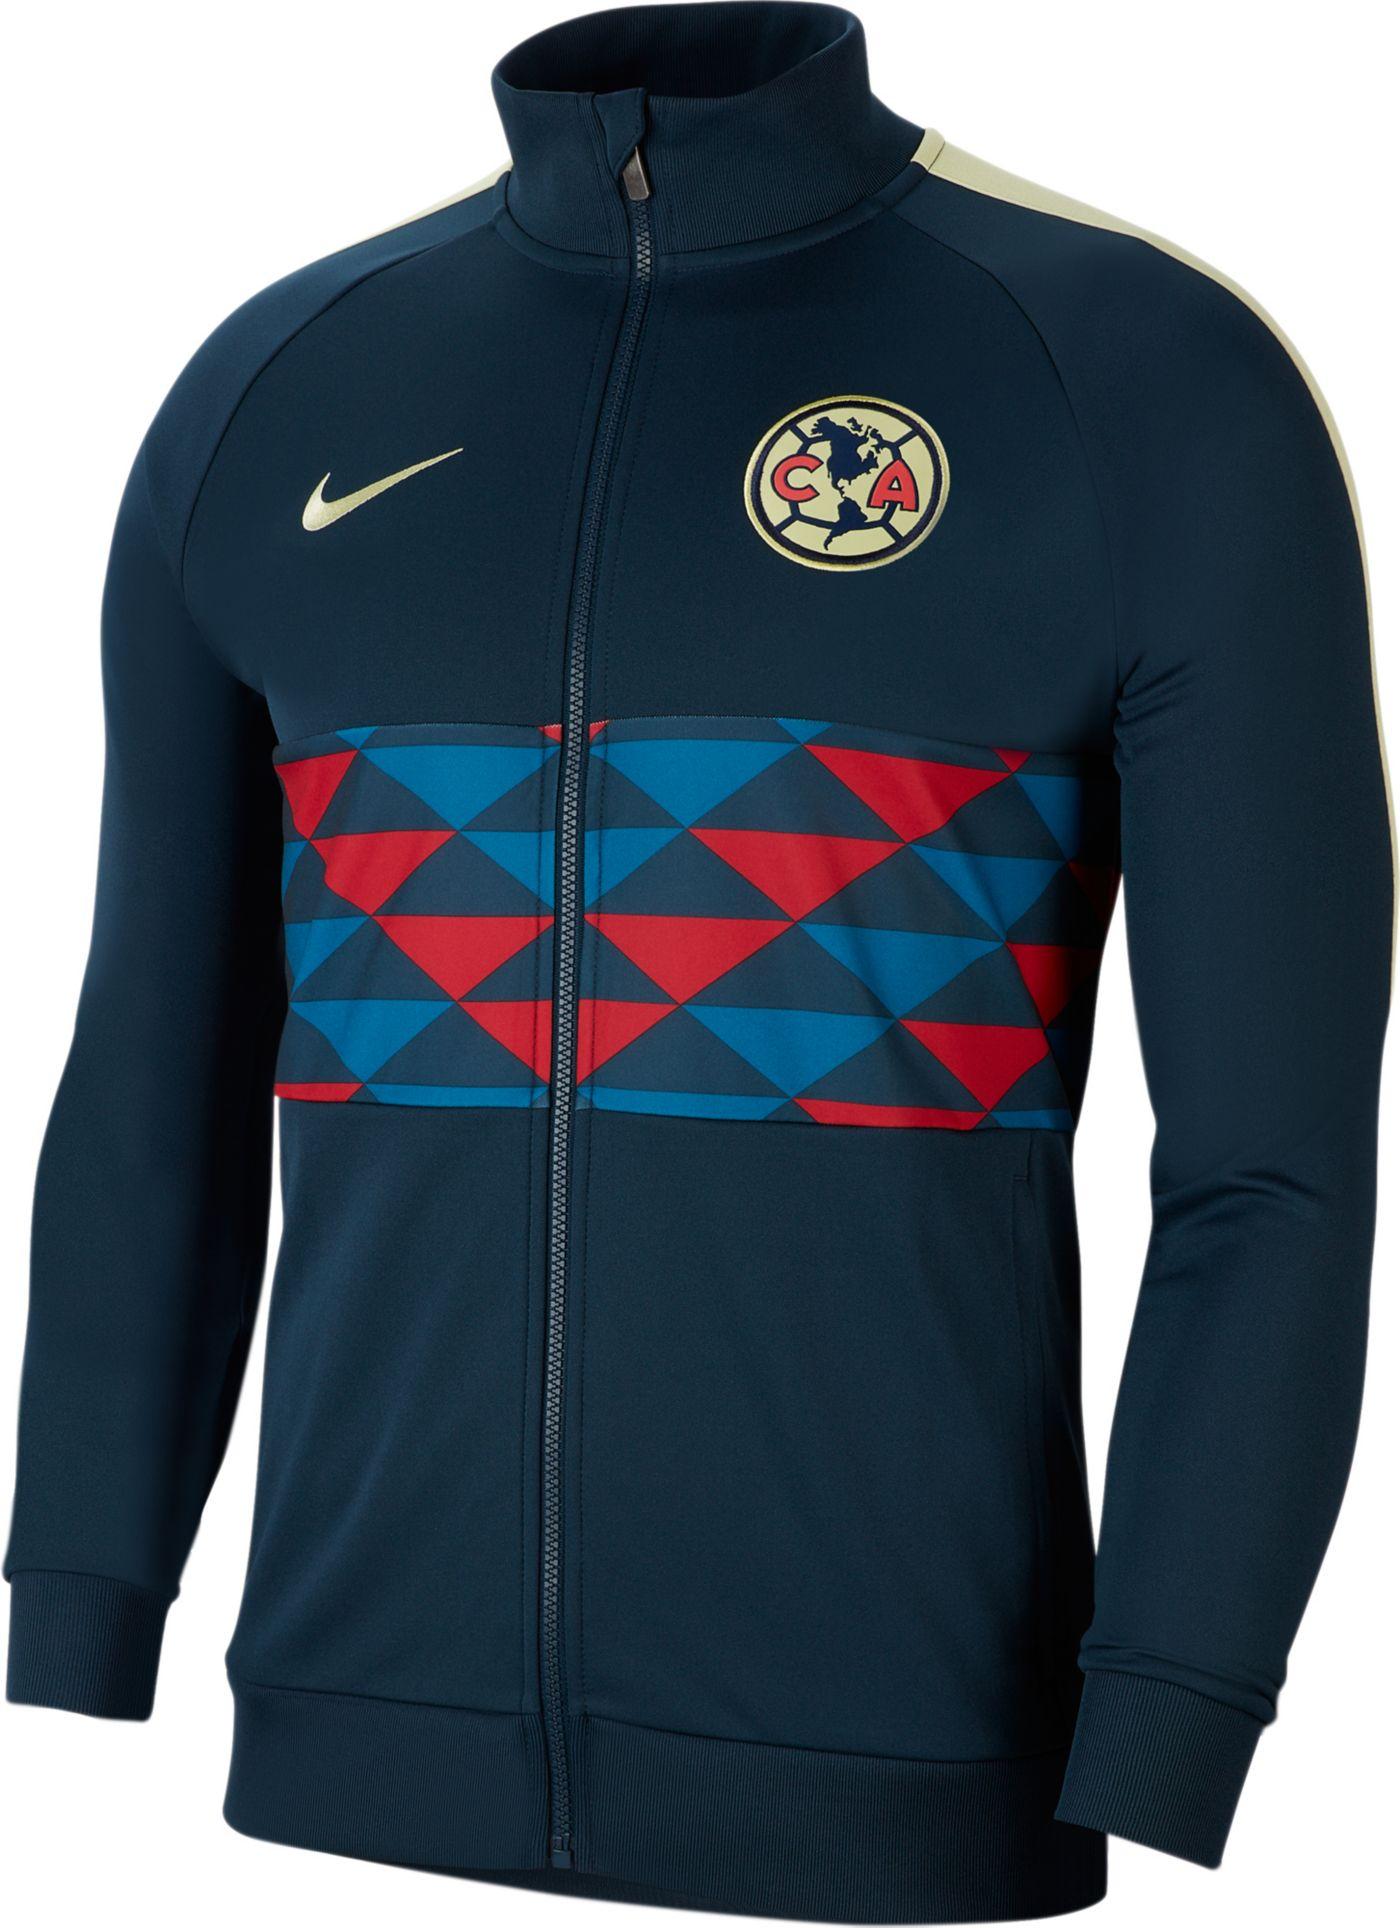 Nike Men's Club America I96 Navy Full-Zip Jacket